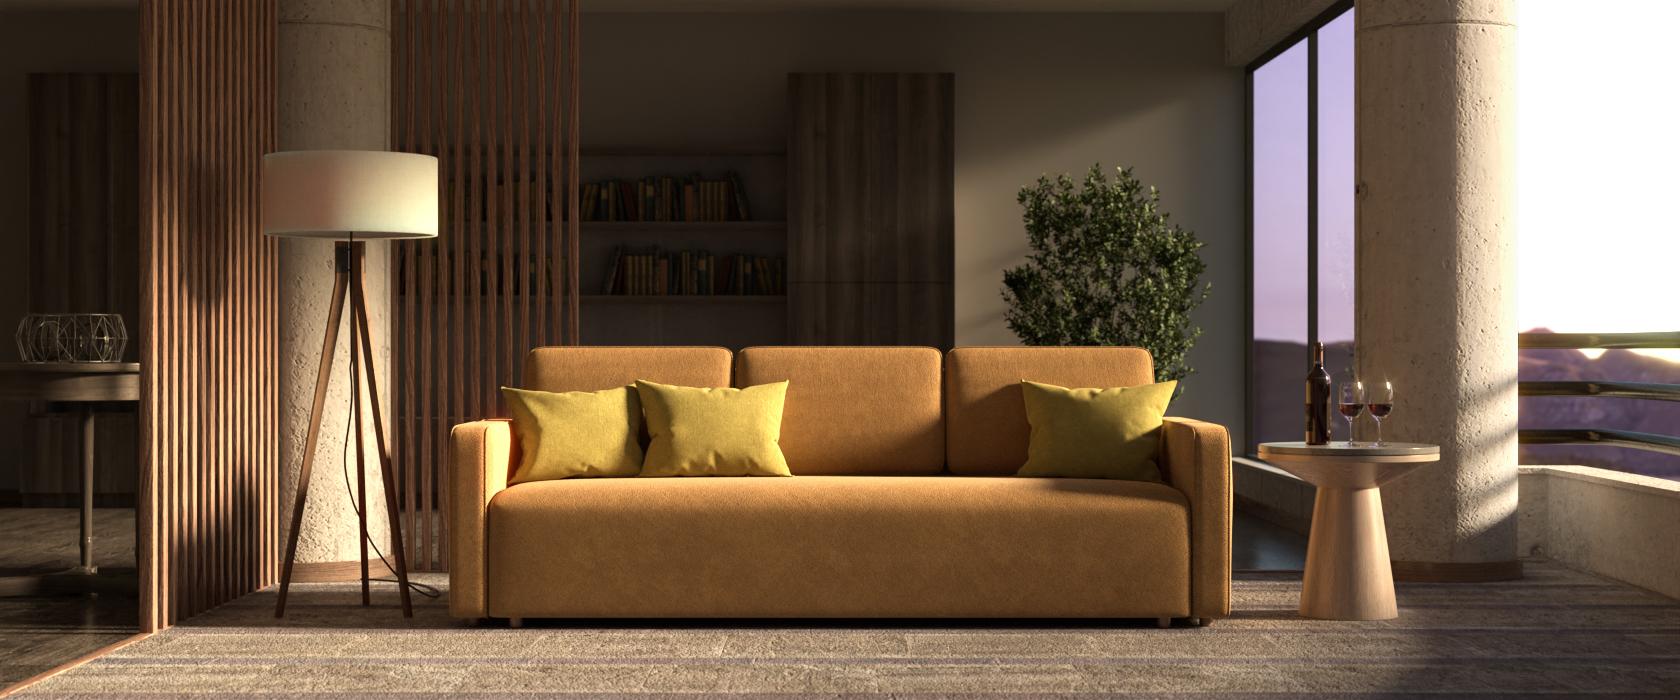 Трехместный диван Alonzo - Фото 2 - Pufetto